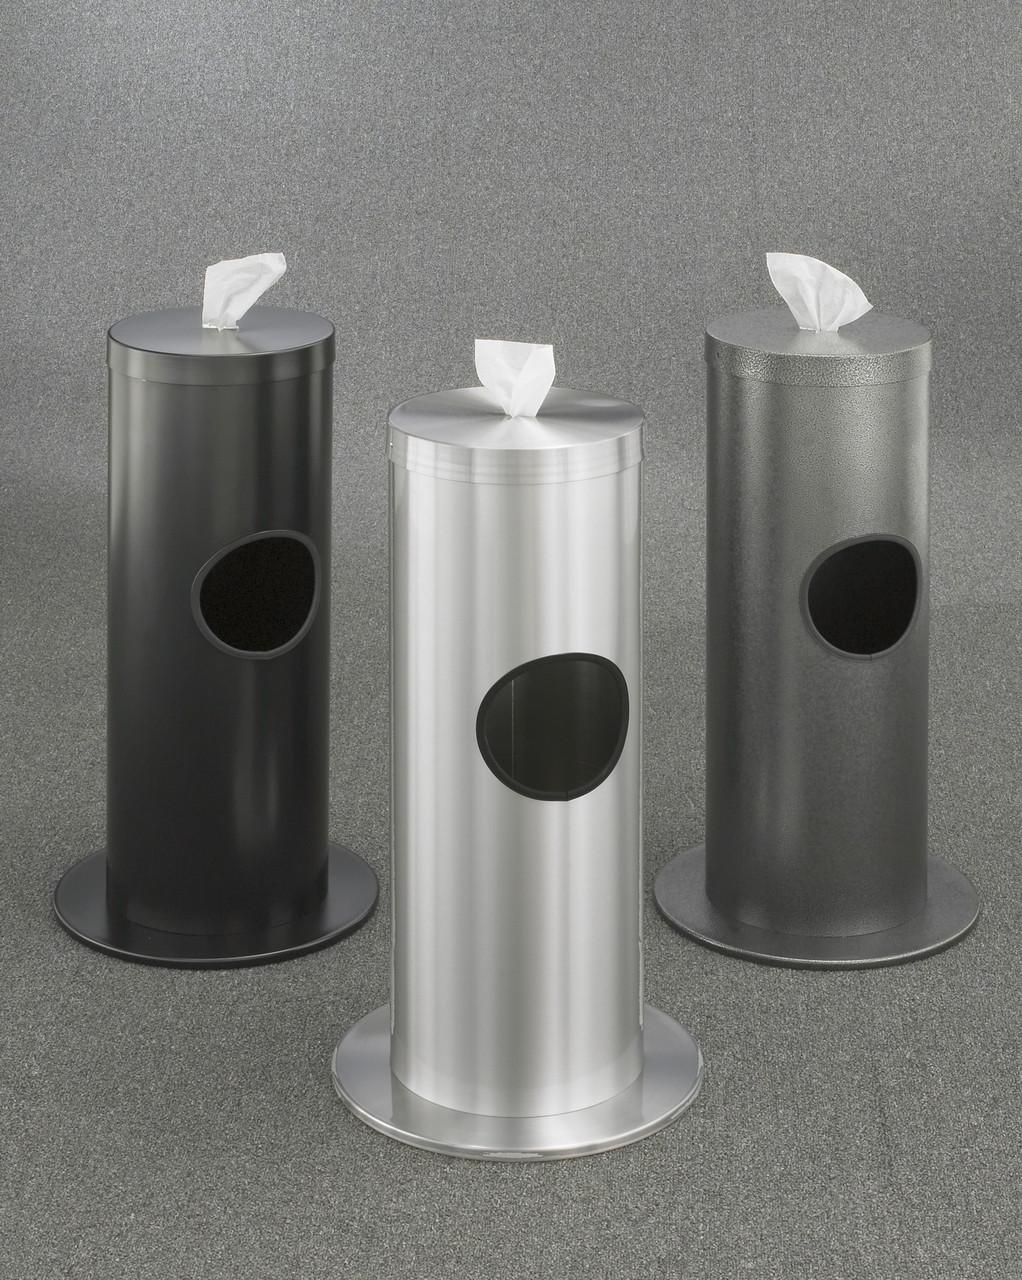 2 Gallon Floor Standing Sanitizing Wipe Dispenser F1029 Designer Color (Satin Black, Satin Aluminum, Silver Vein Shown)